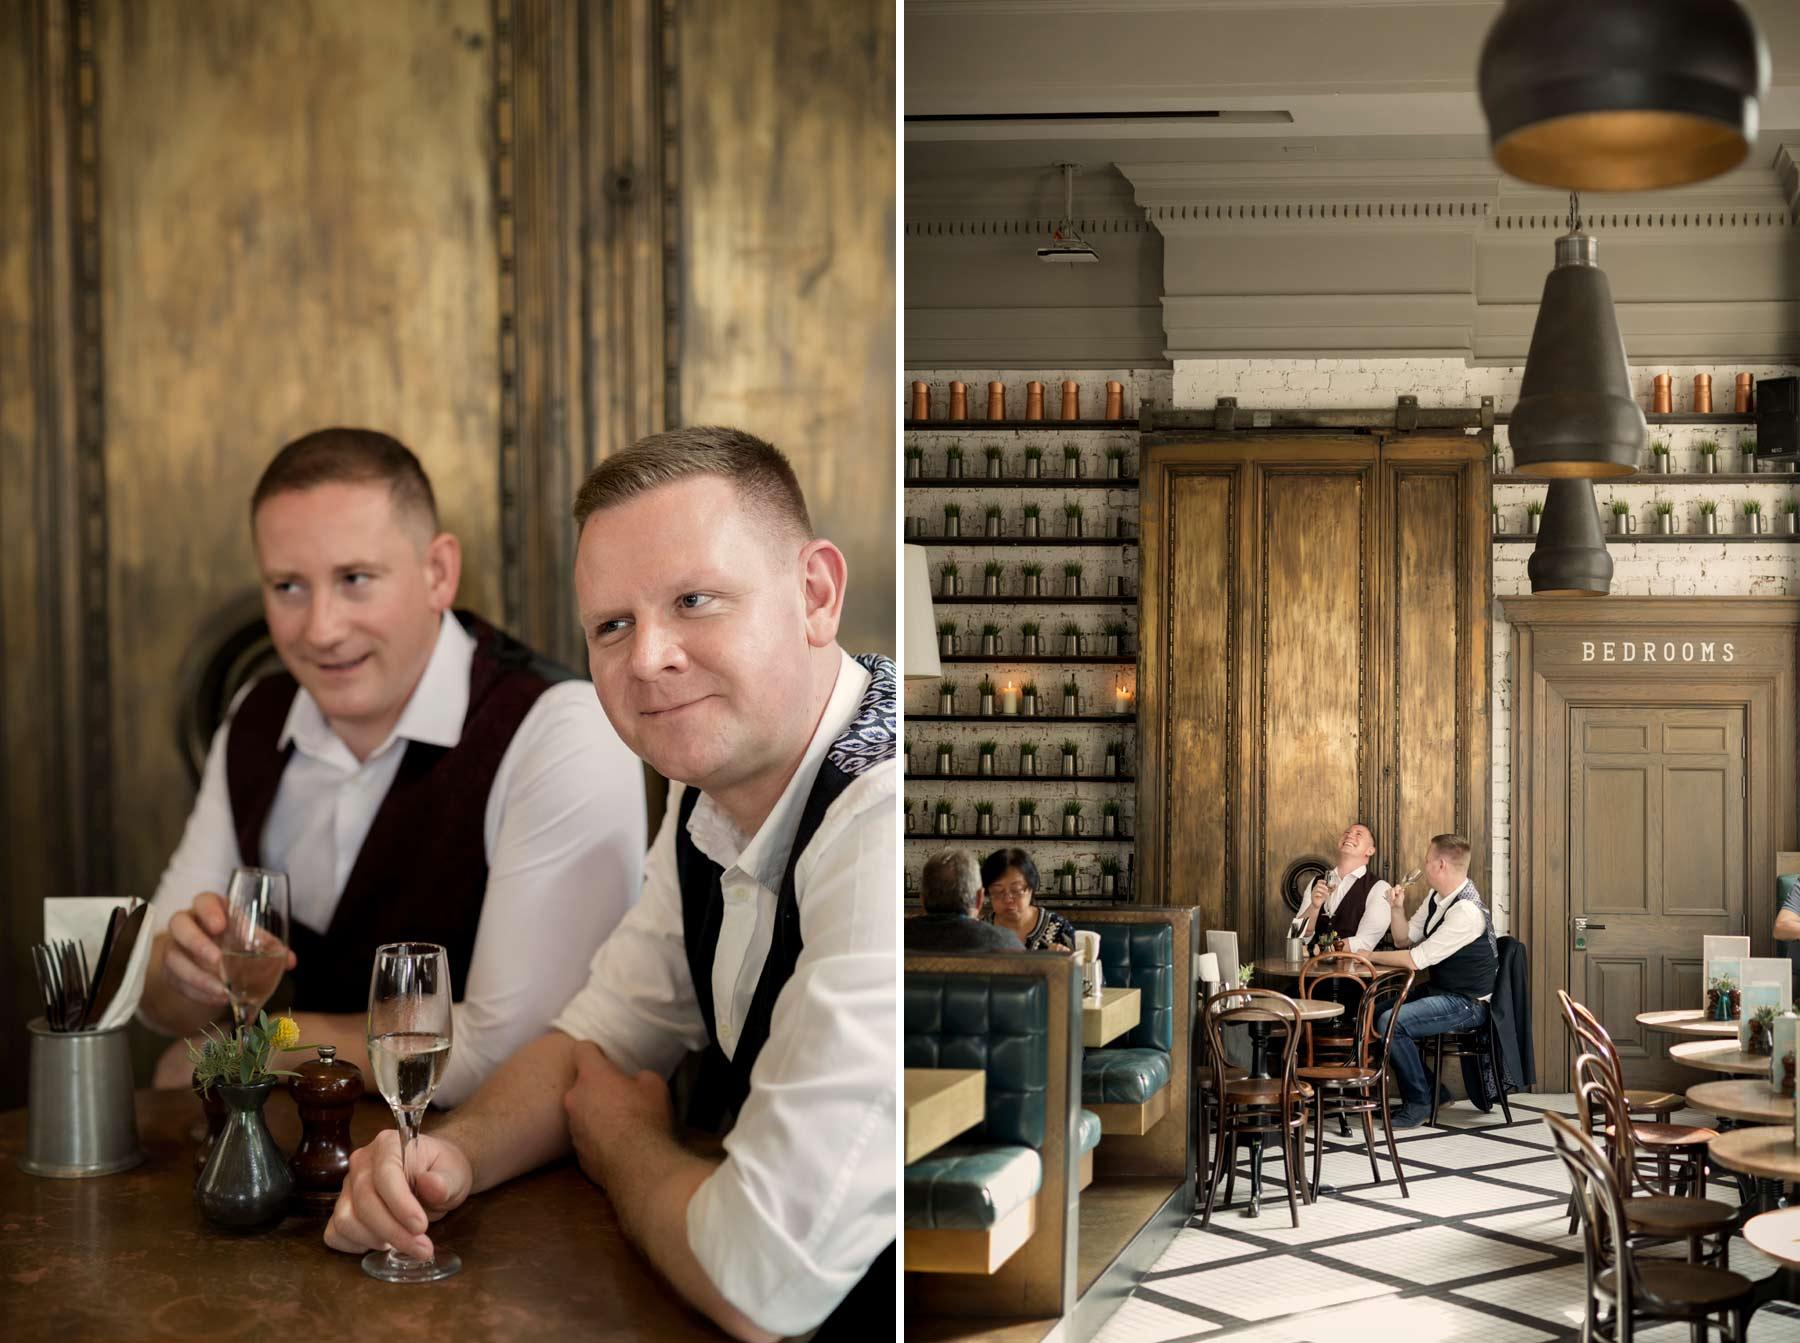 engagement session, Edinburgh, Inn on the mile, gay, portraits,